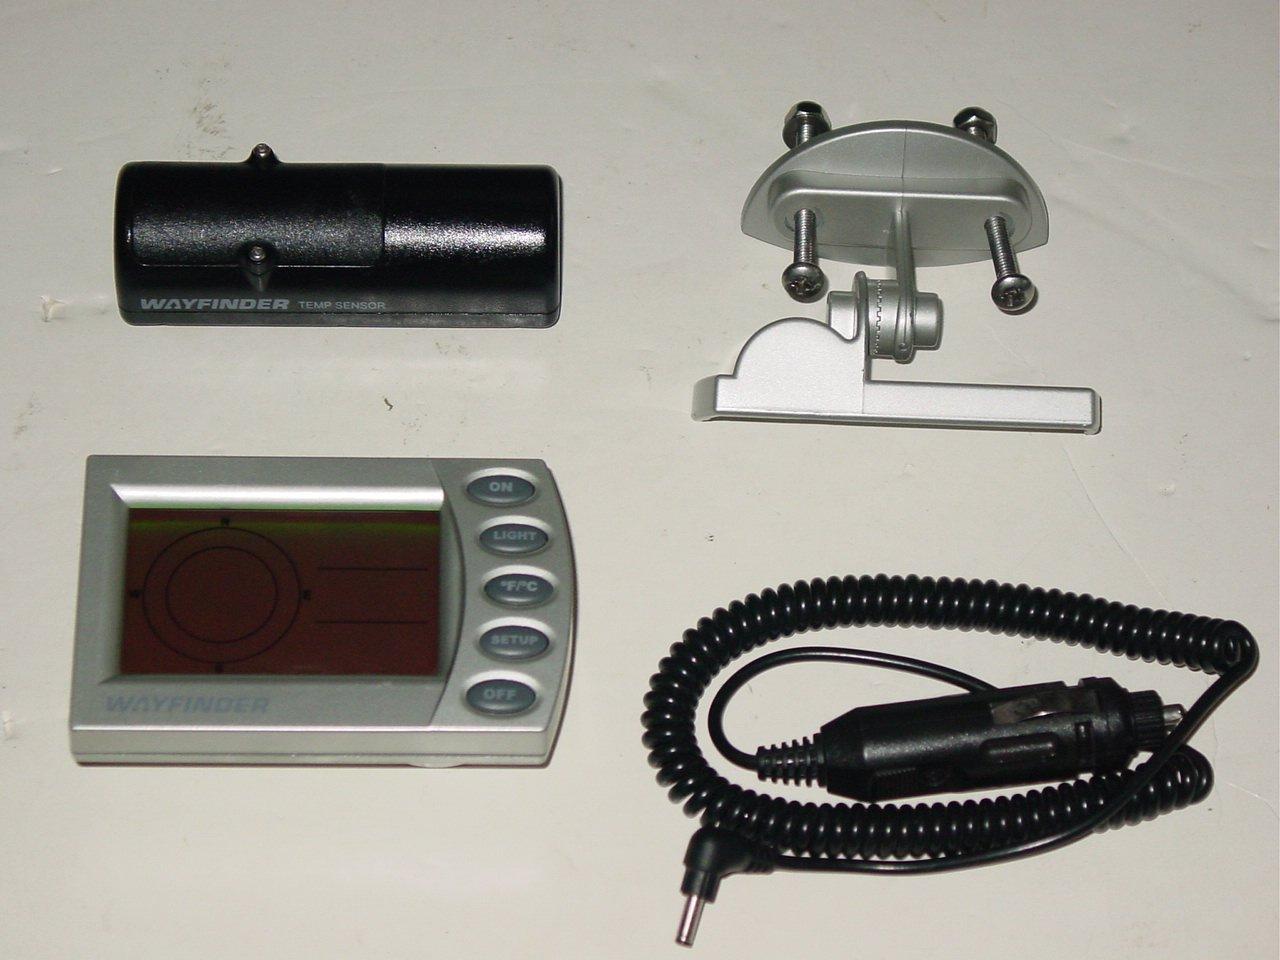 Wayfinder V2020 Wireless Digital Vehicle Compass & Thermometer w/ Temp Sensor